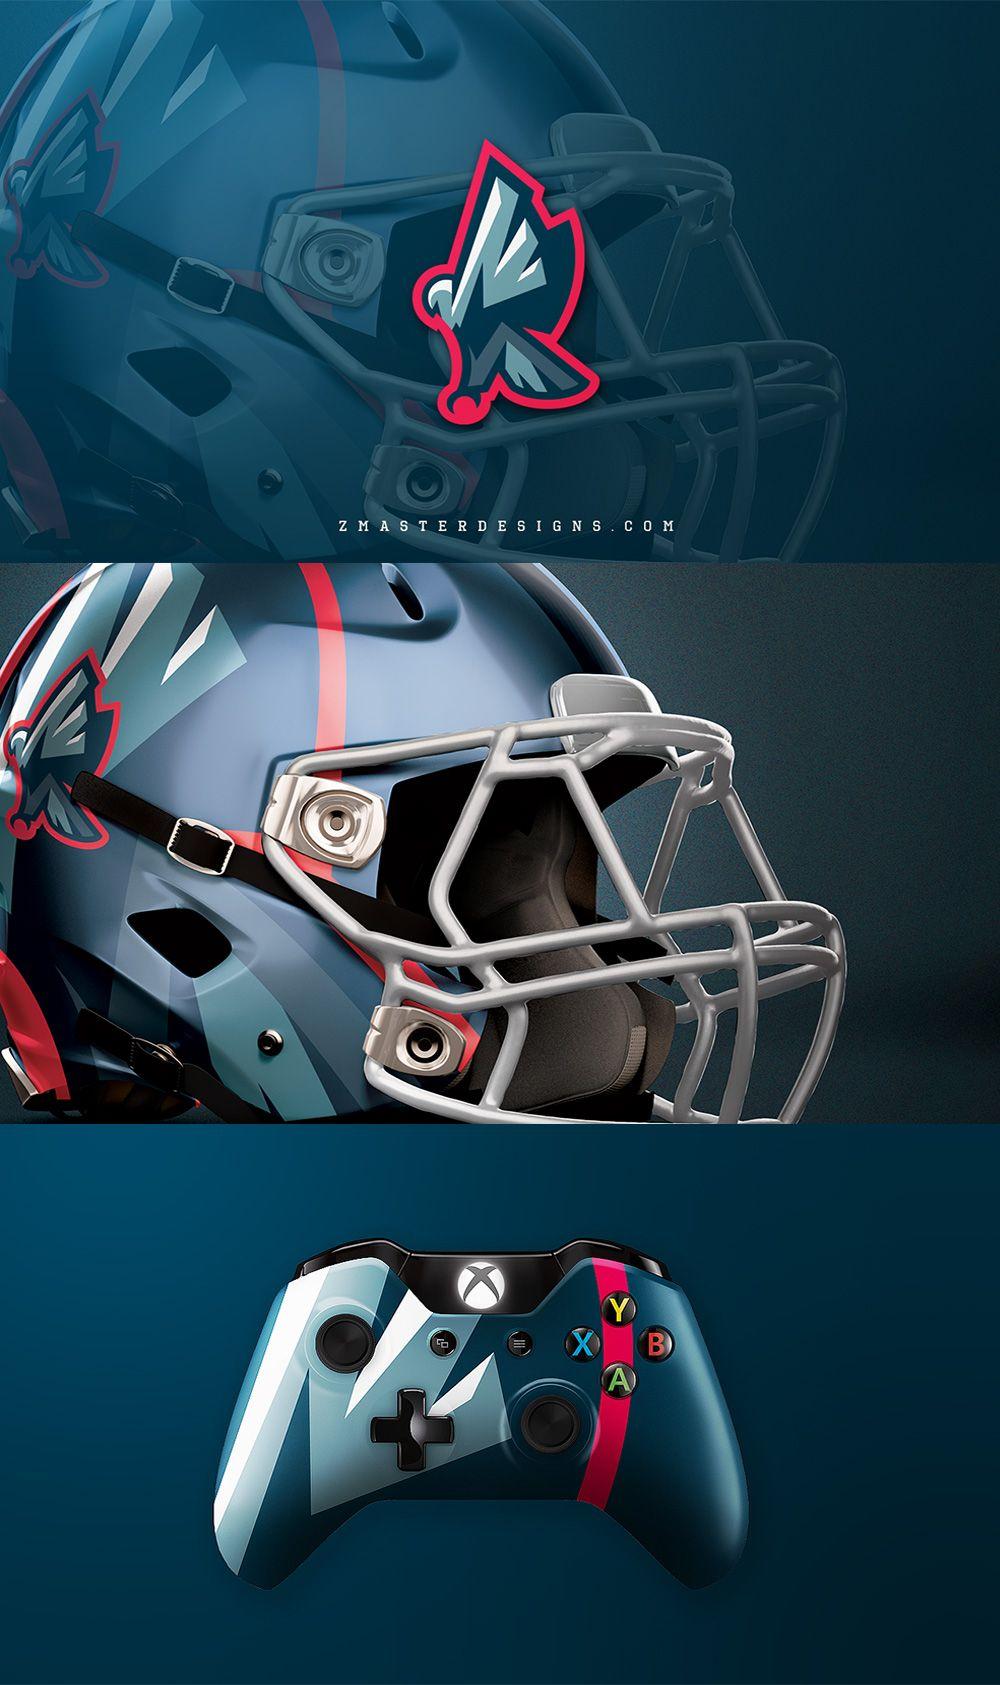 55 Amazing American Football Team Logos And Identity Designs